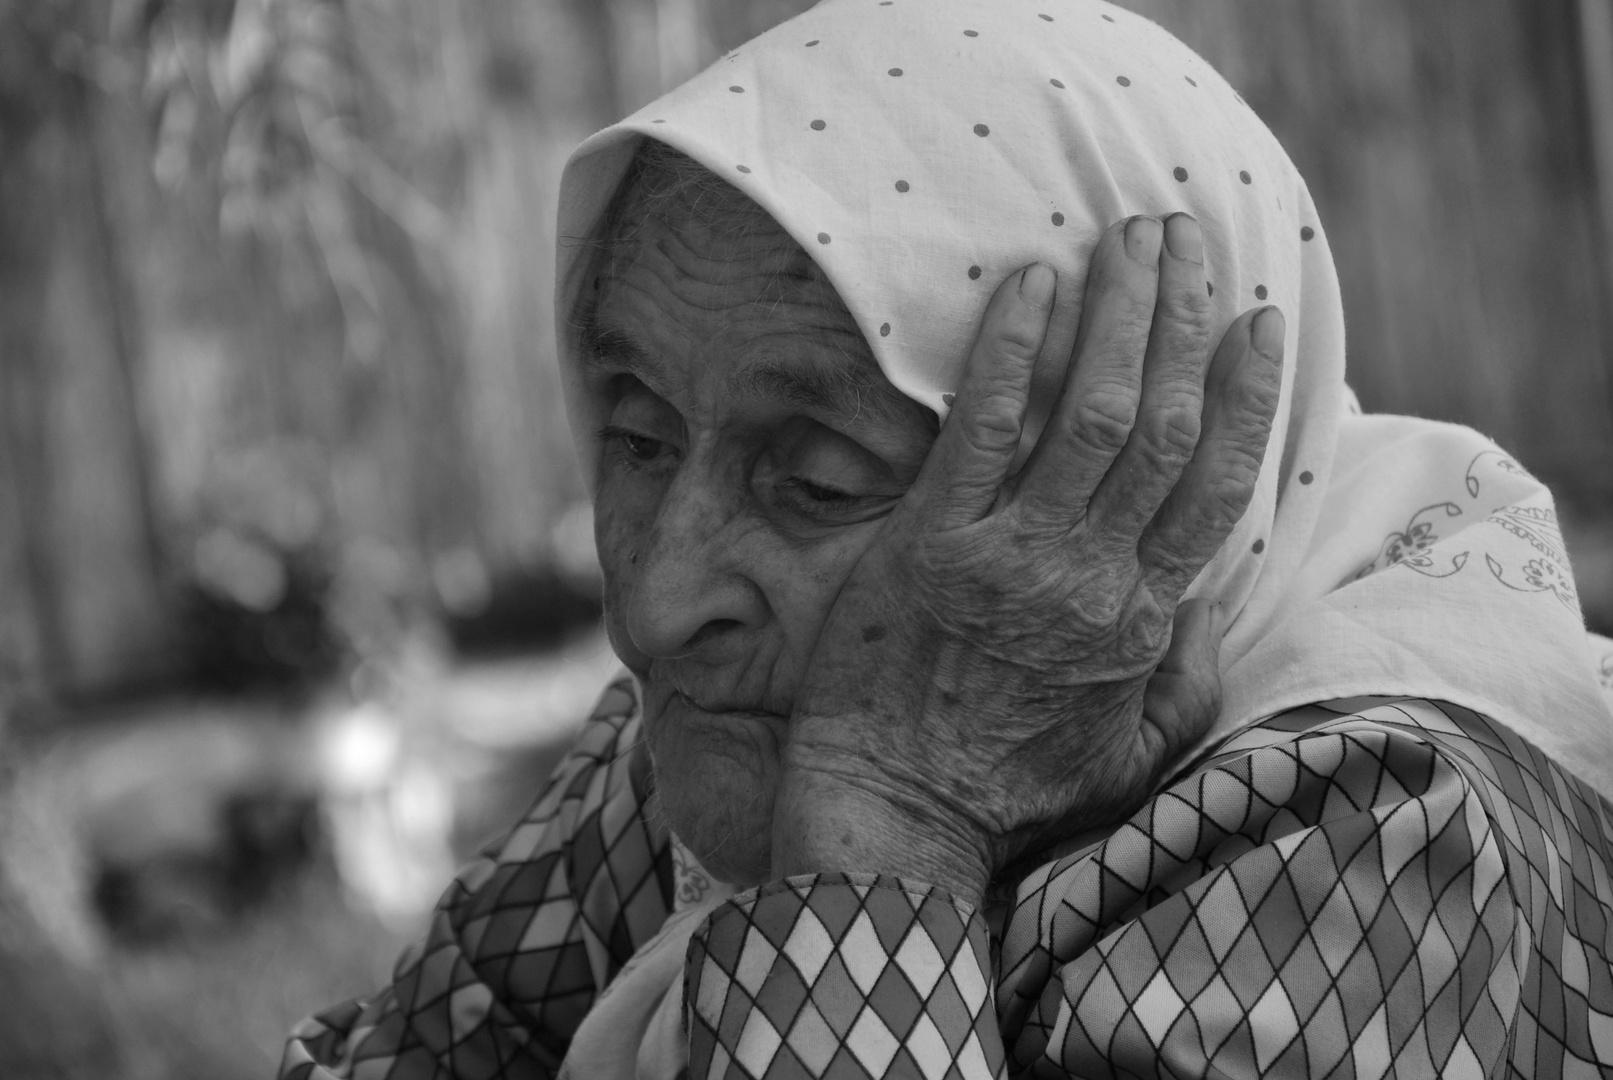 Alte Frau nachdenklich